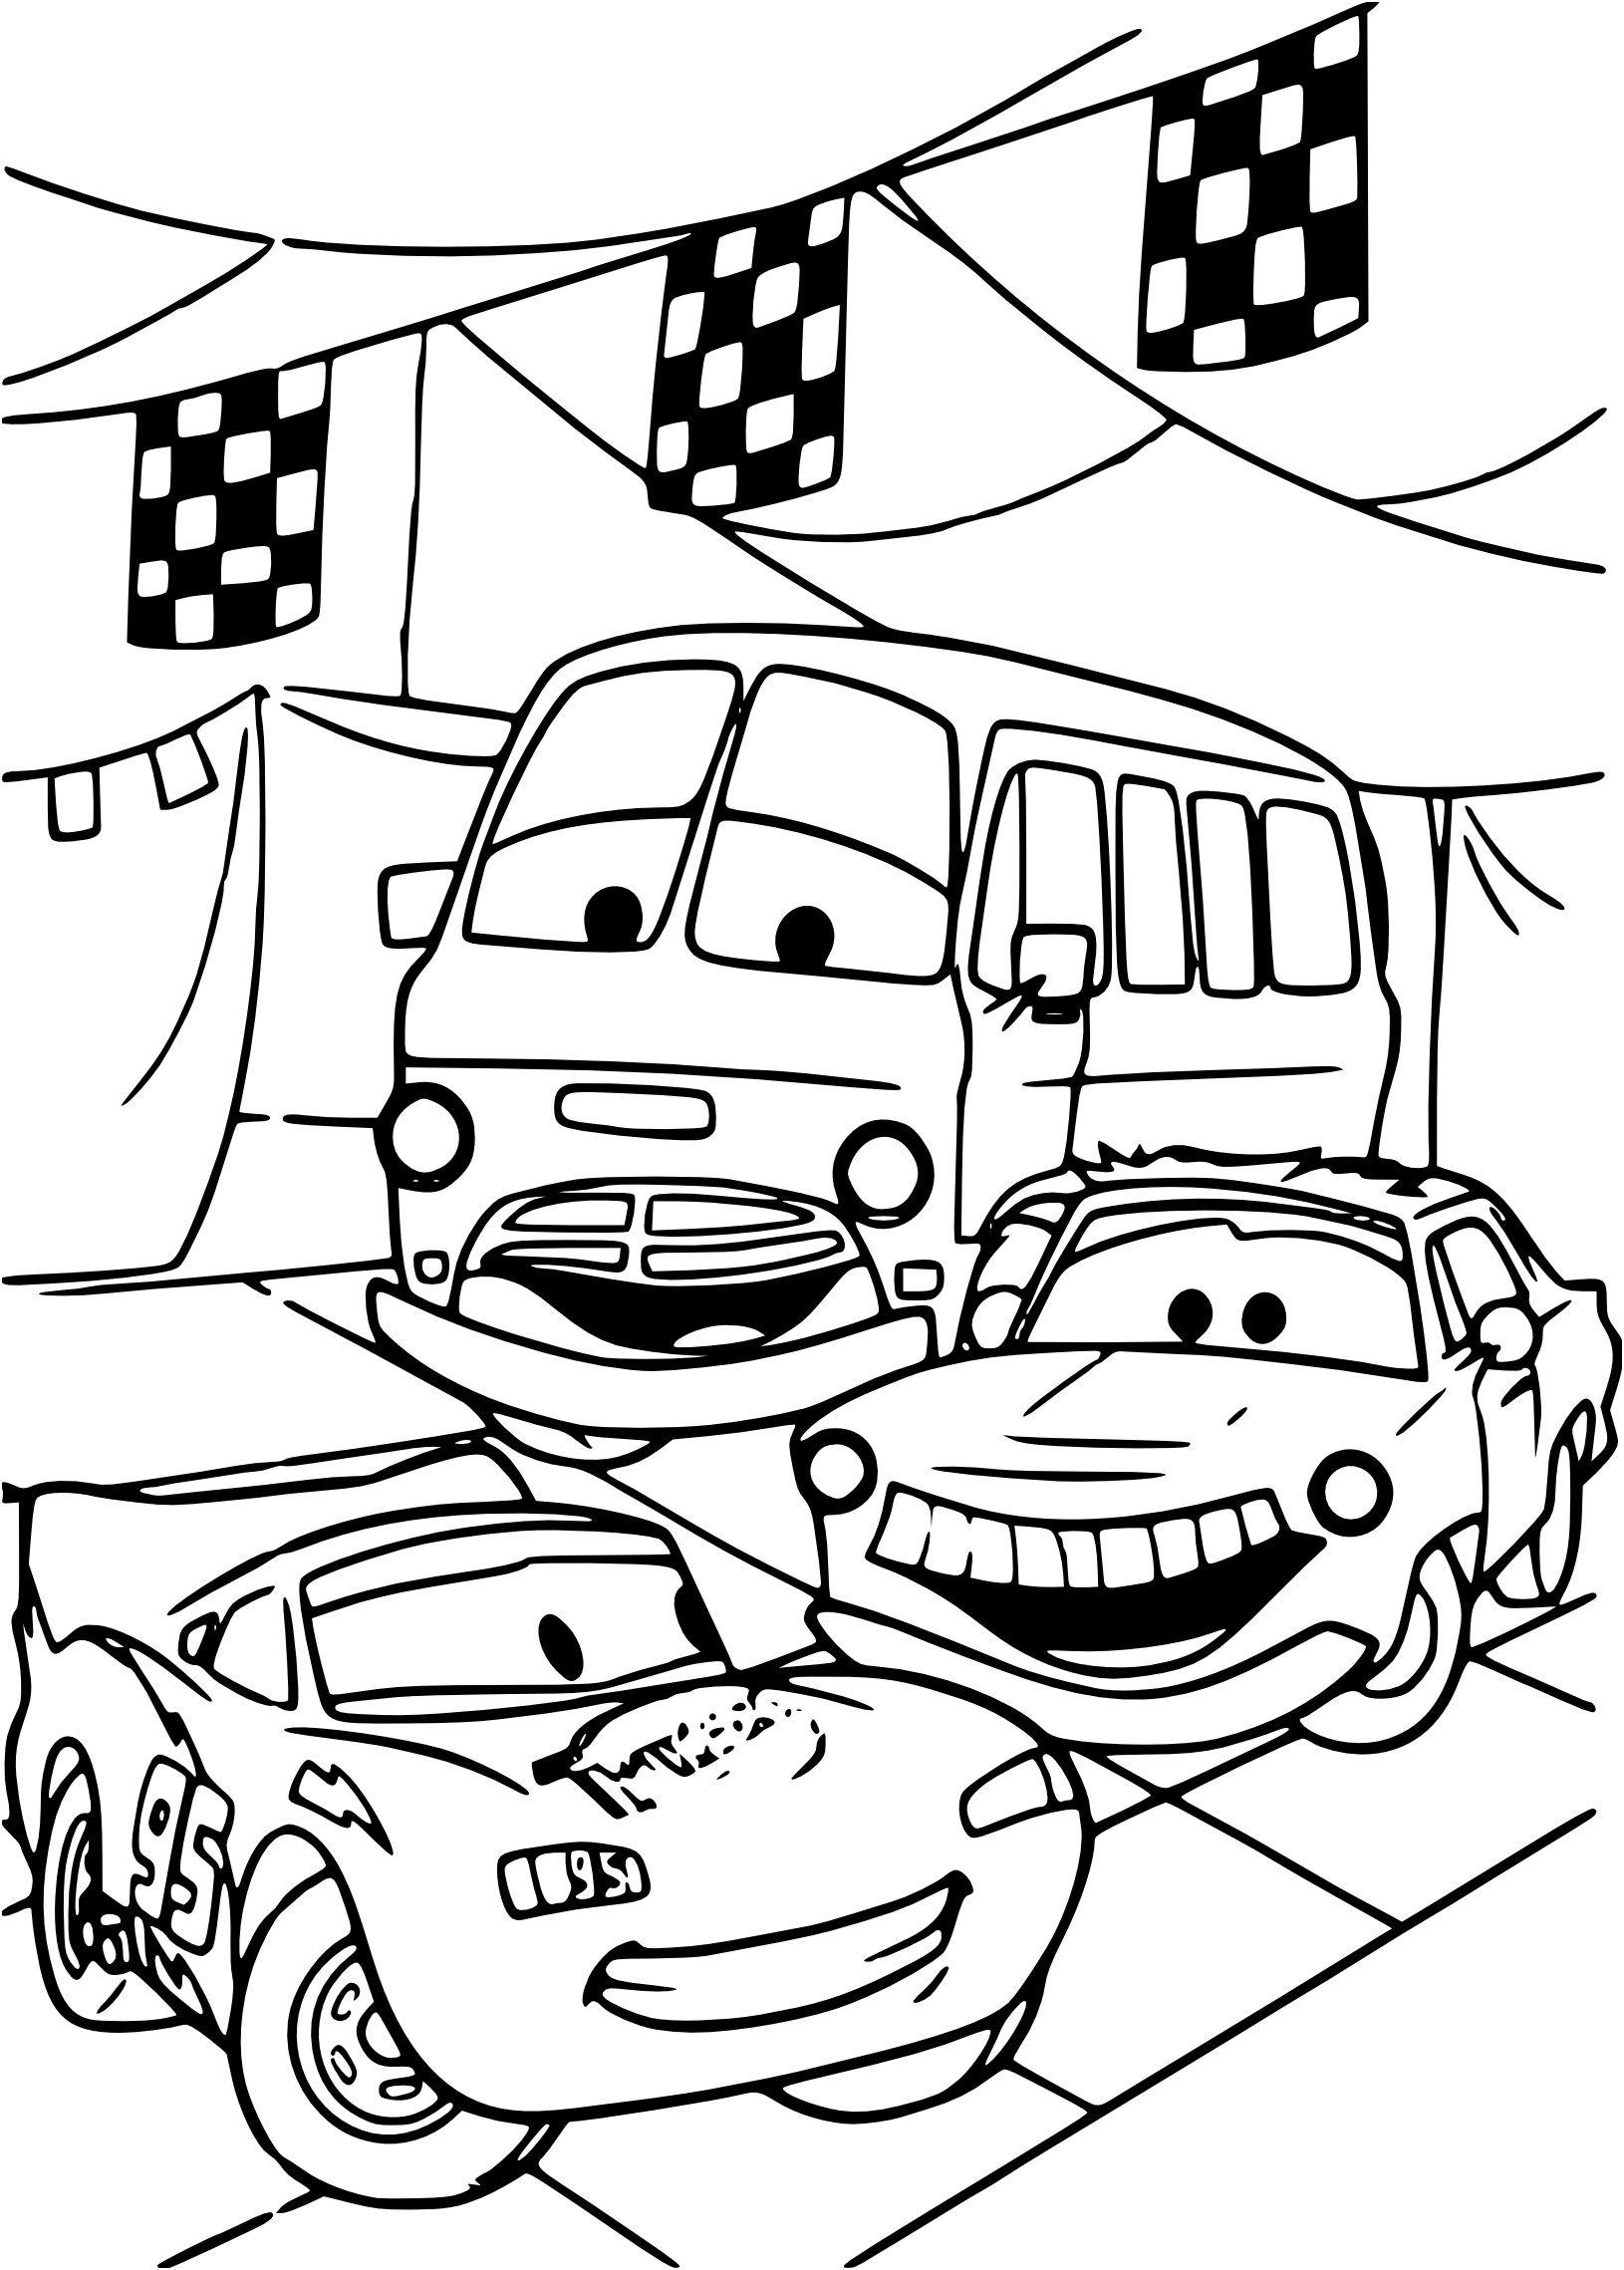 13 Positif Dessin Disney A Imprimer Collection Disney Coloring Pages Race Car Coloring Pages Coloring Books